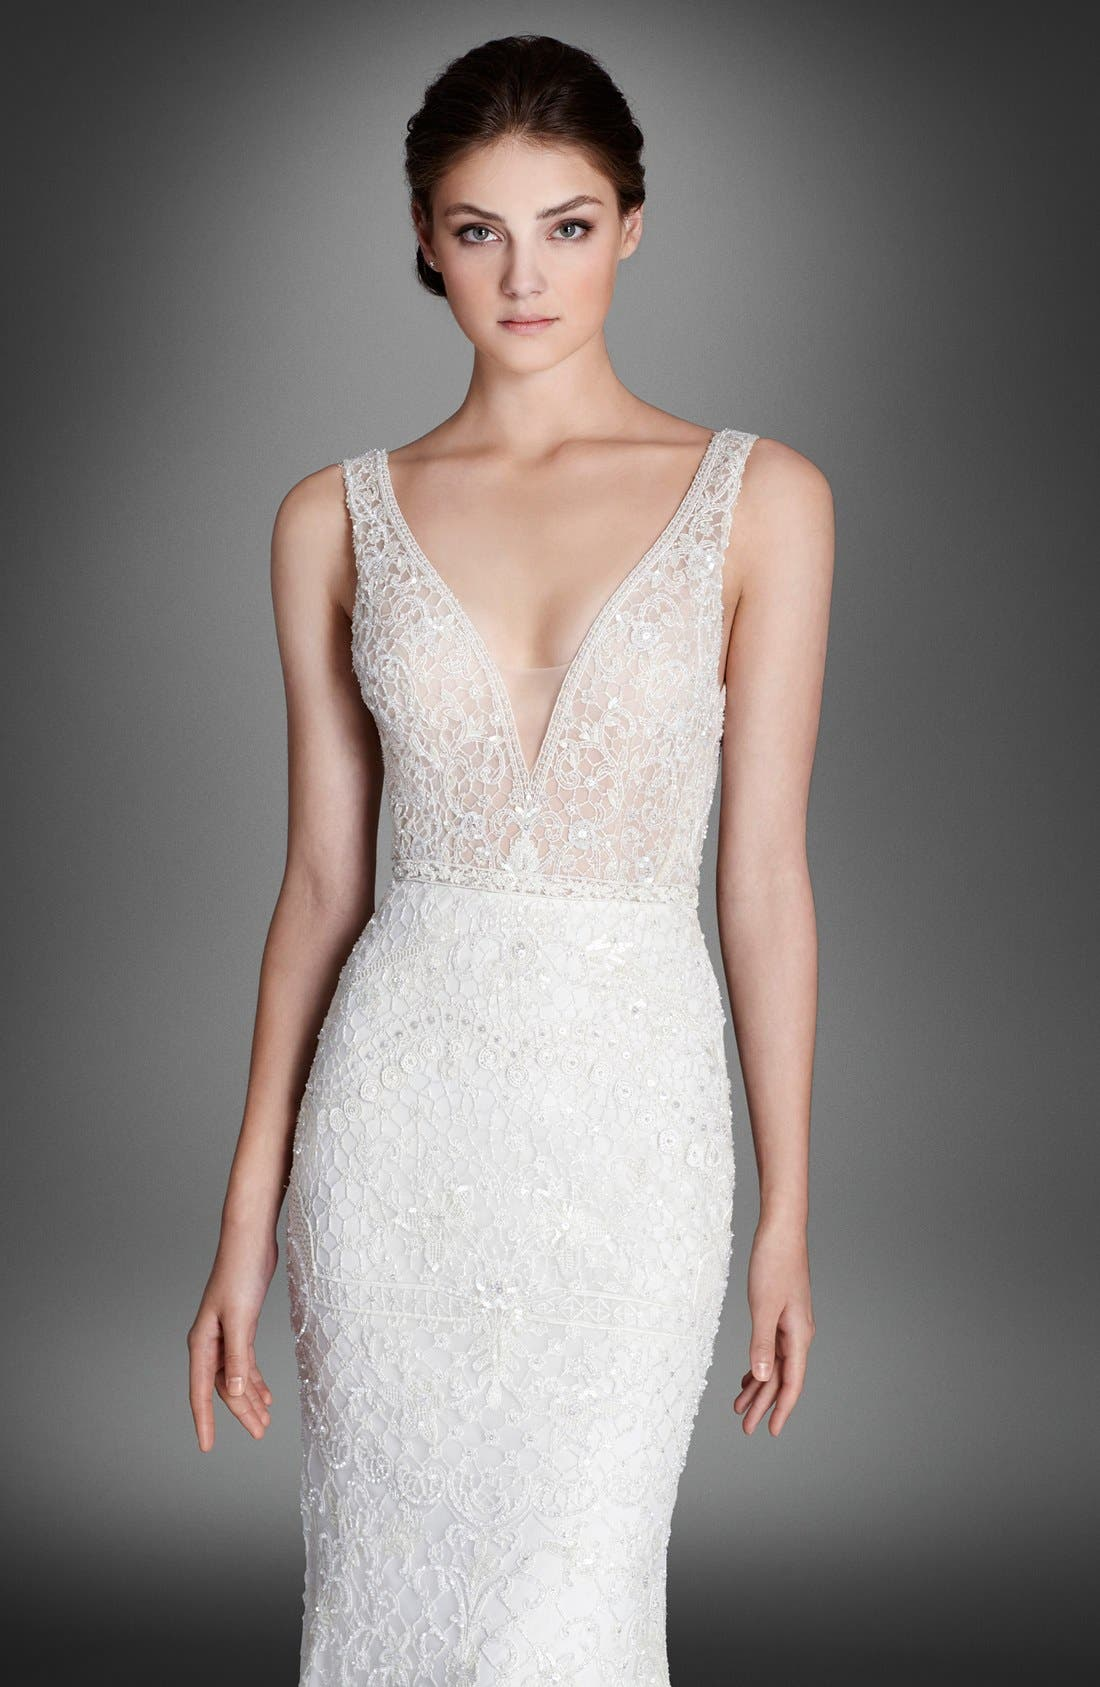 Crystal Beaded Column Dress,                             Alternate thumbnail 2, color,                             901